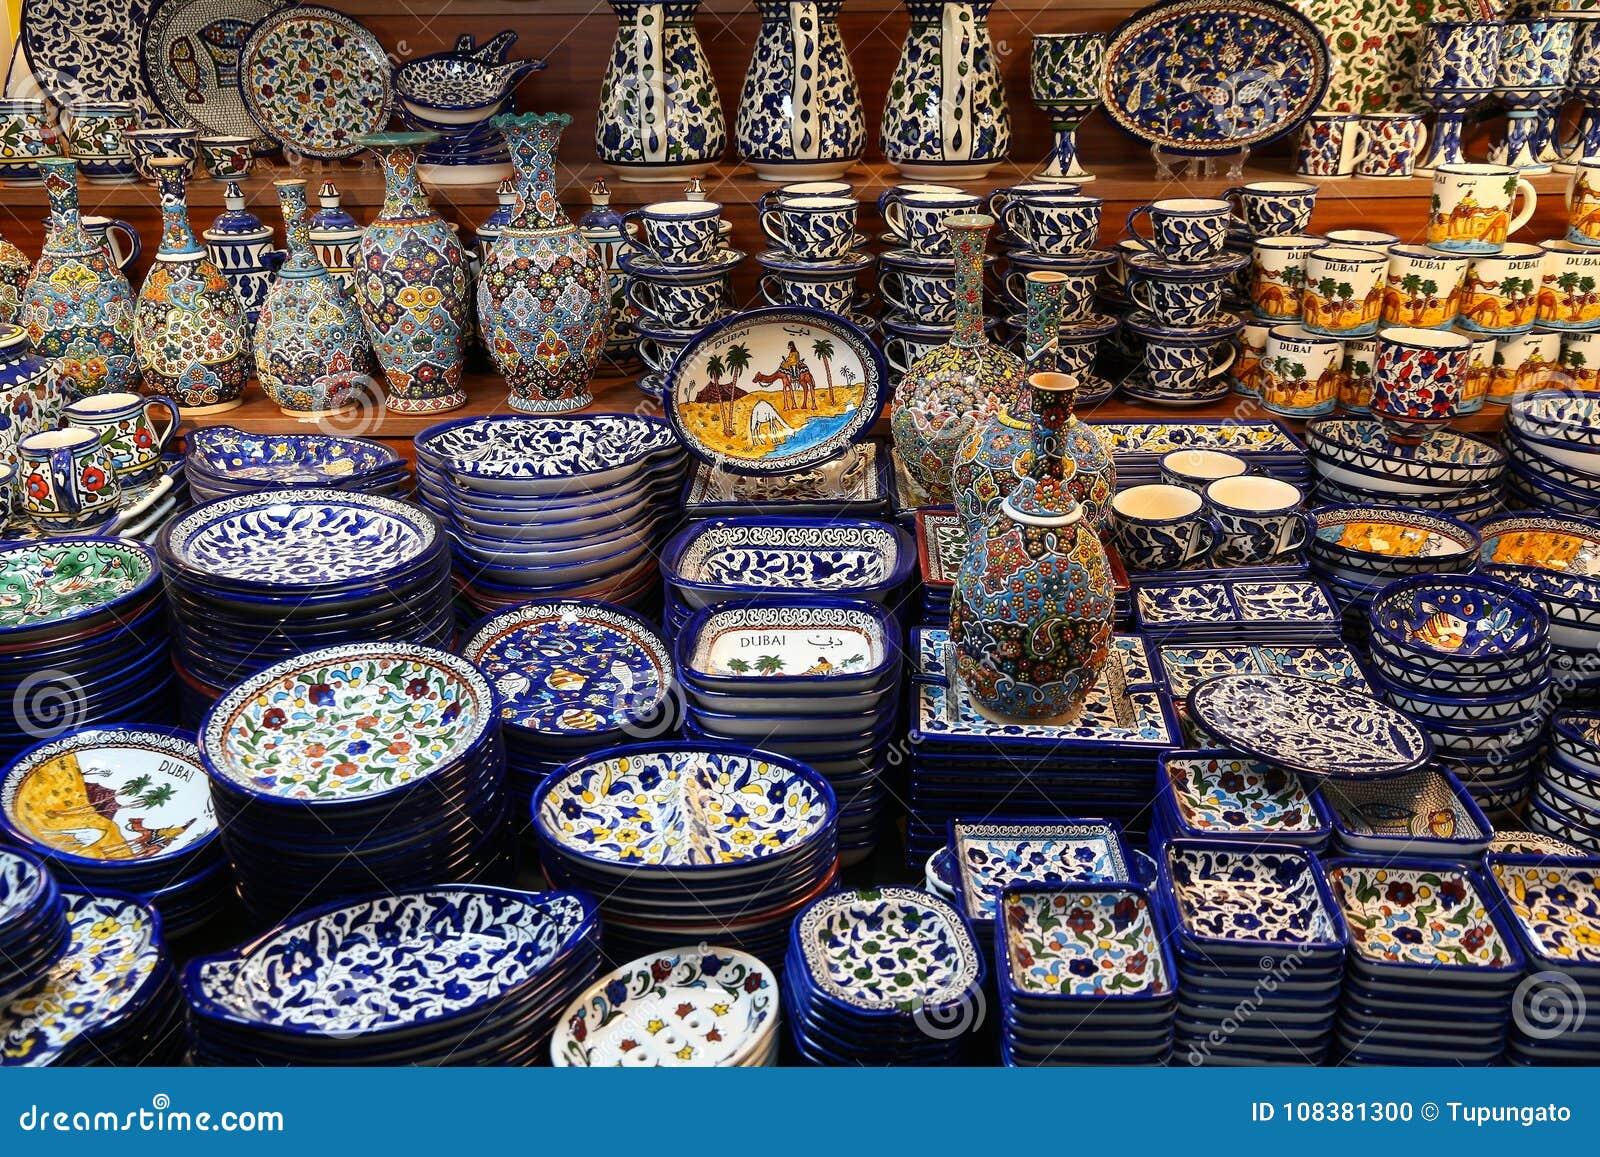 Arabic Handicraft Objects Stock Photo Image Of Emirates 108381300